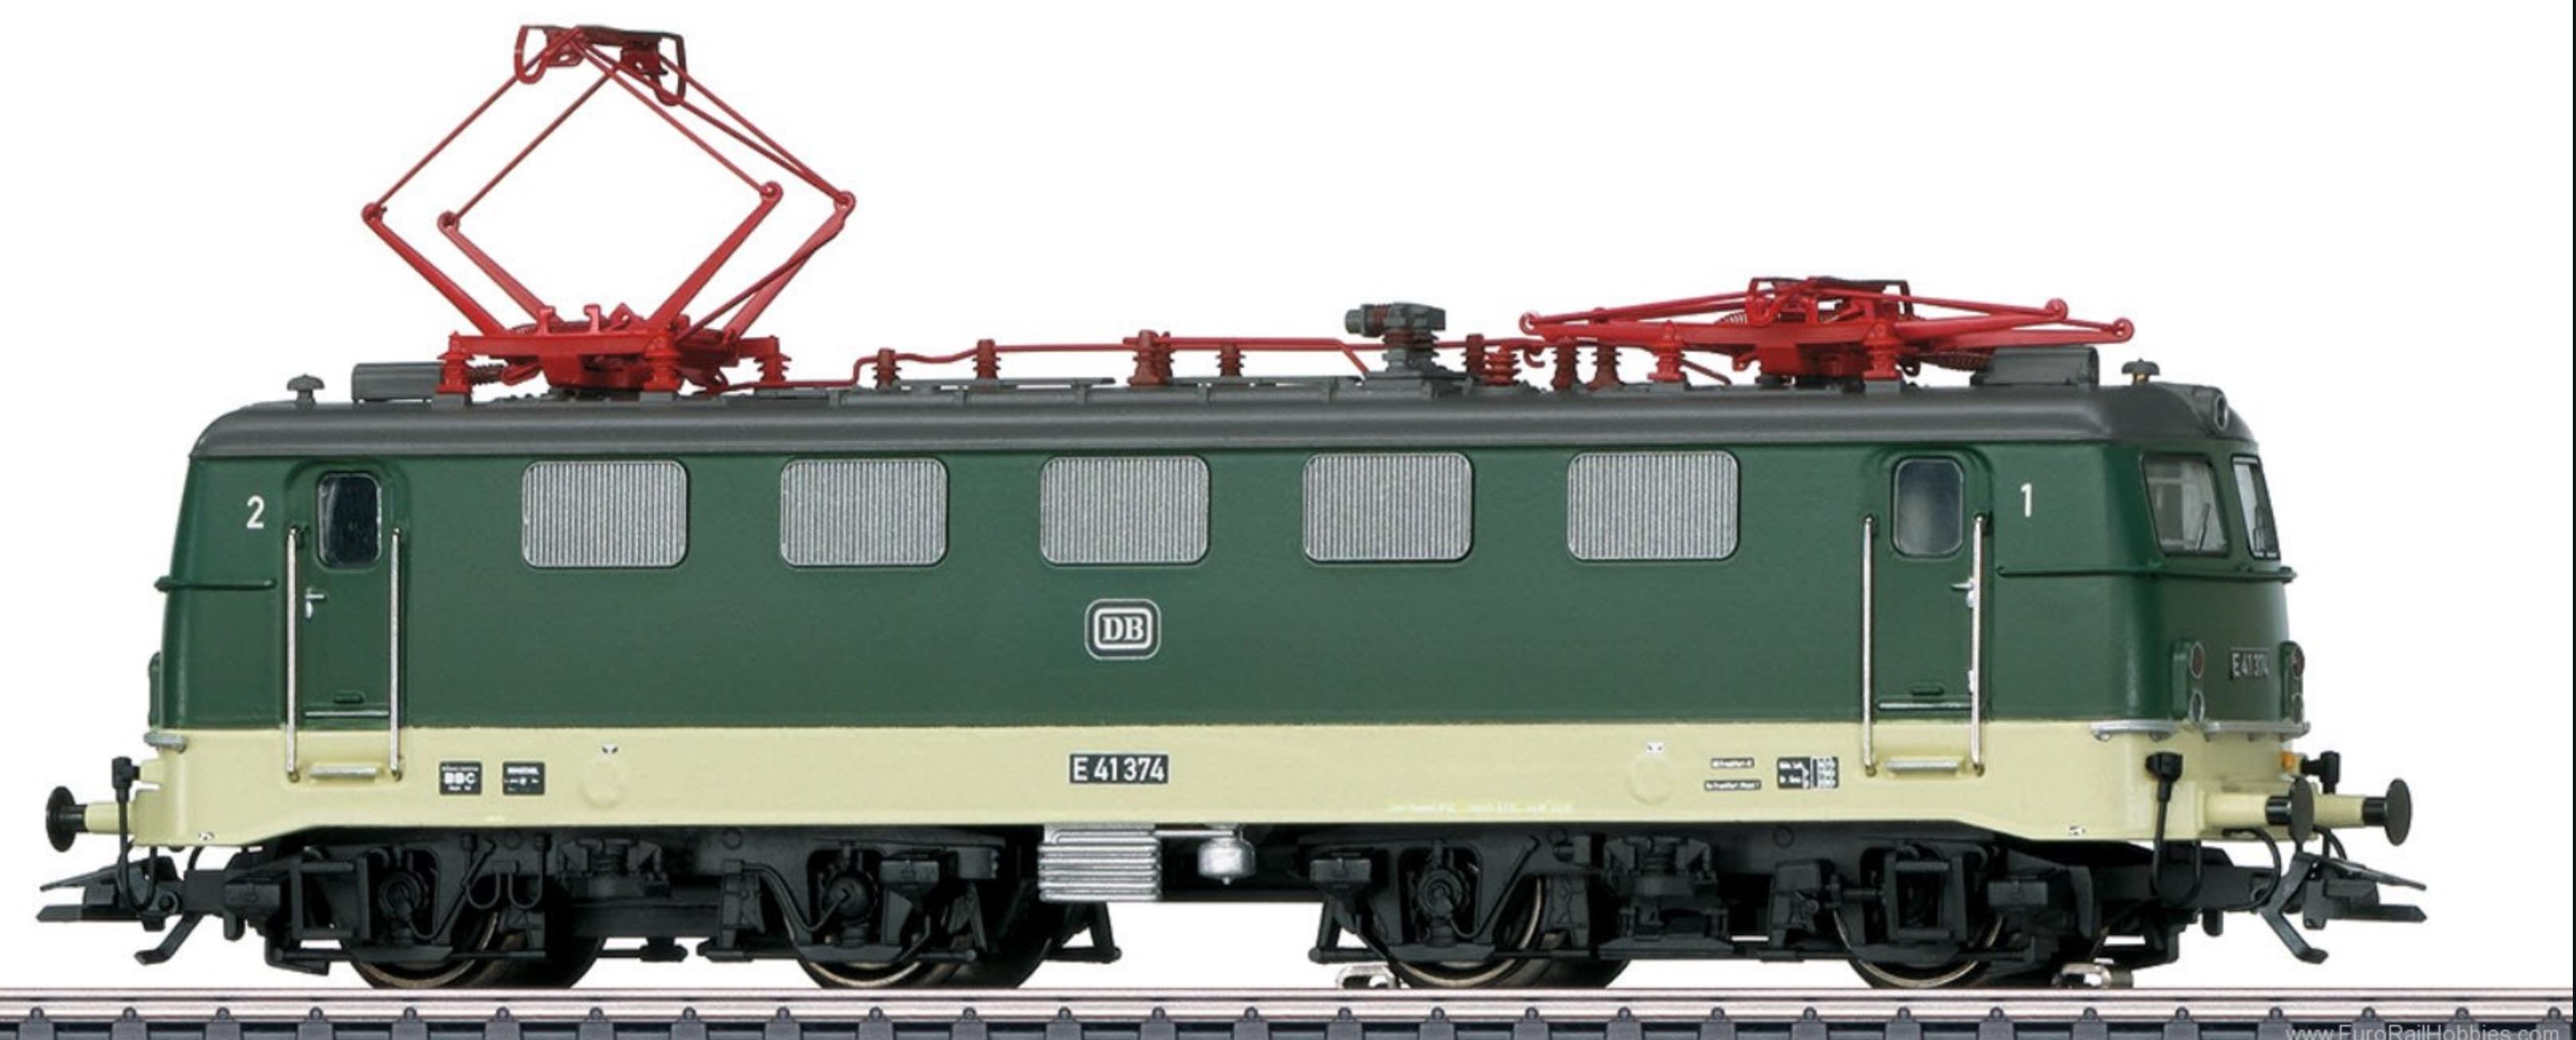 Another Marklin Eurotrain Special Edition! HO E41 in Oxide Green and Cream